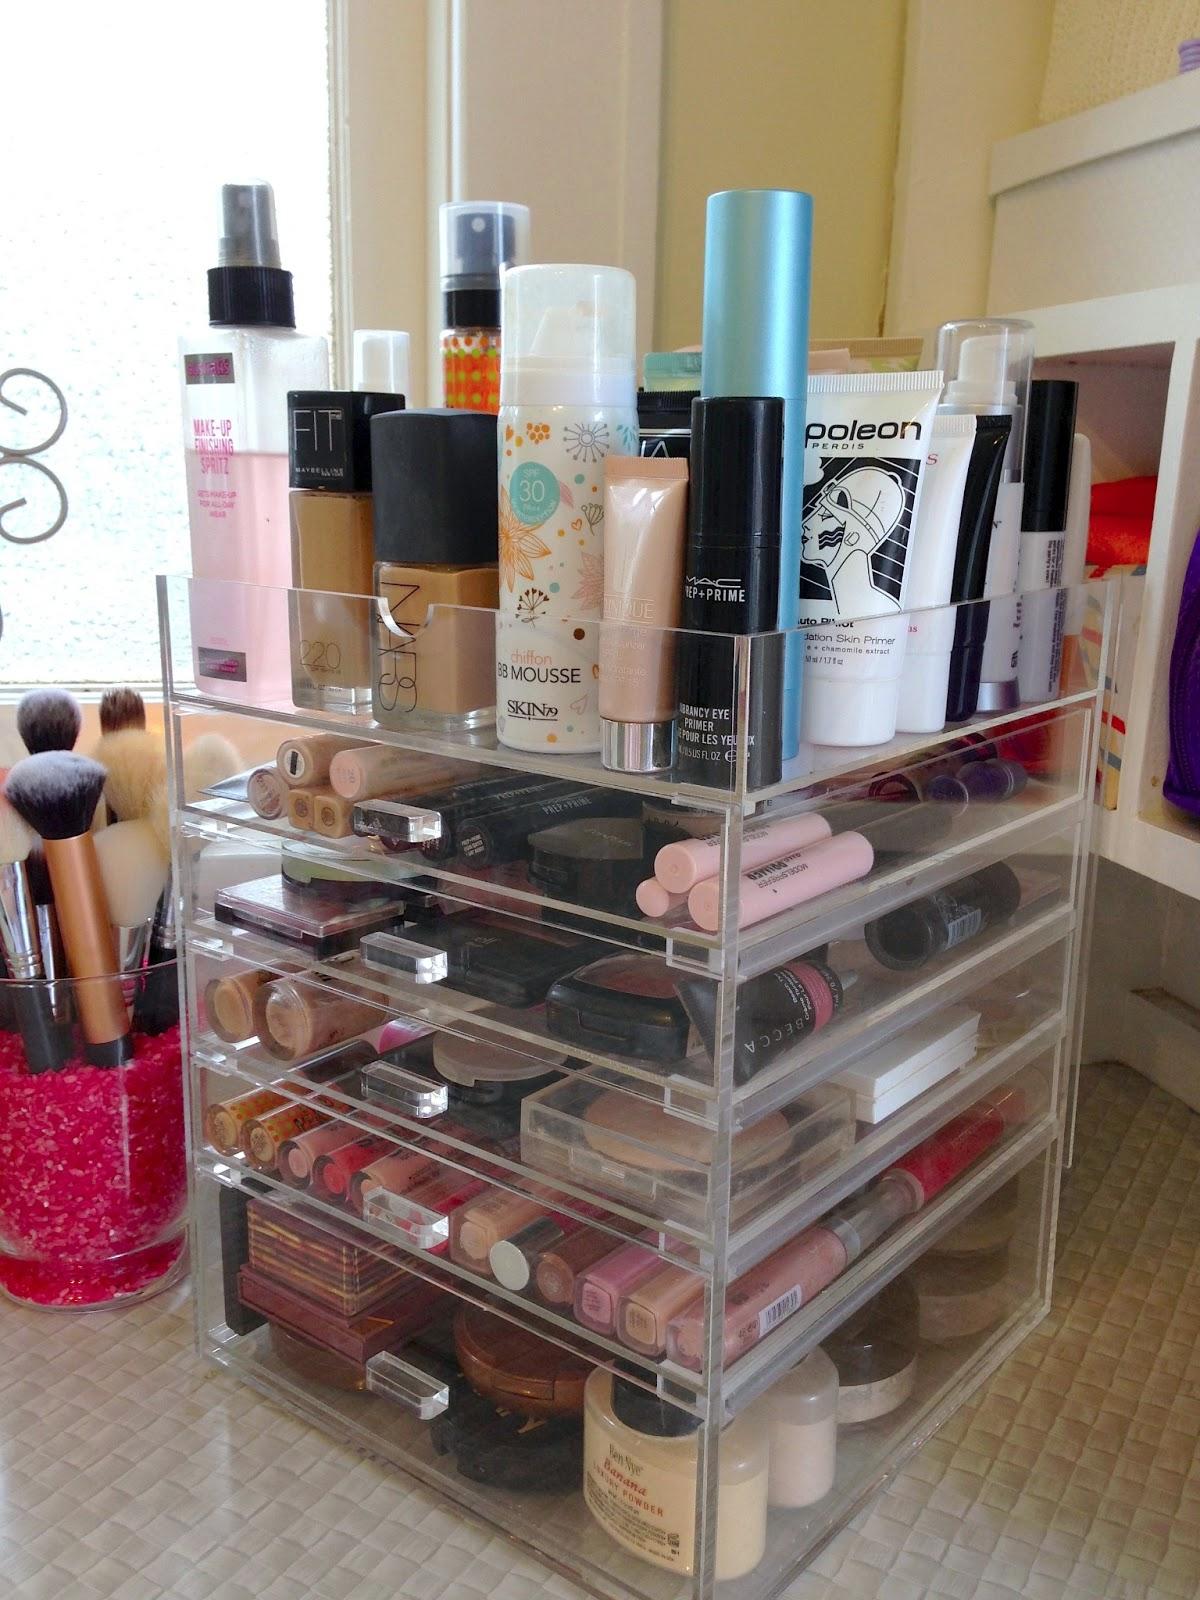 misstango2 my makeup collection. Black Bedroom Furniture Sets. Home Design Ideas